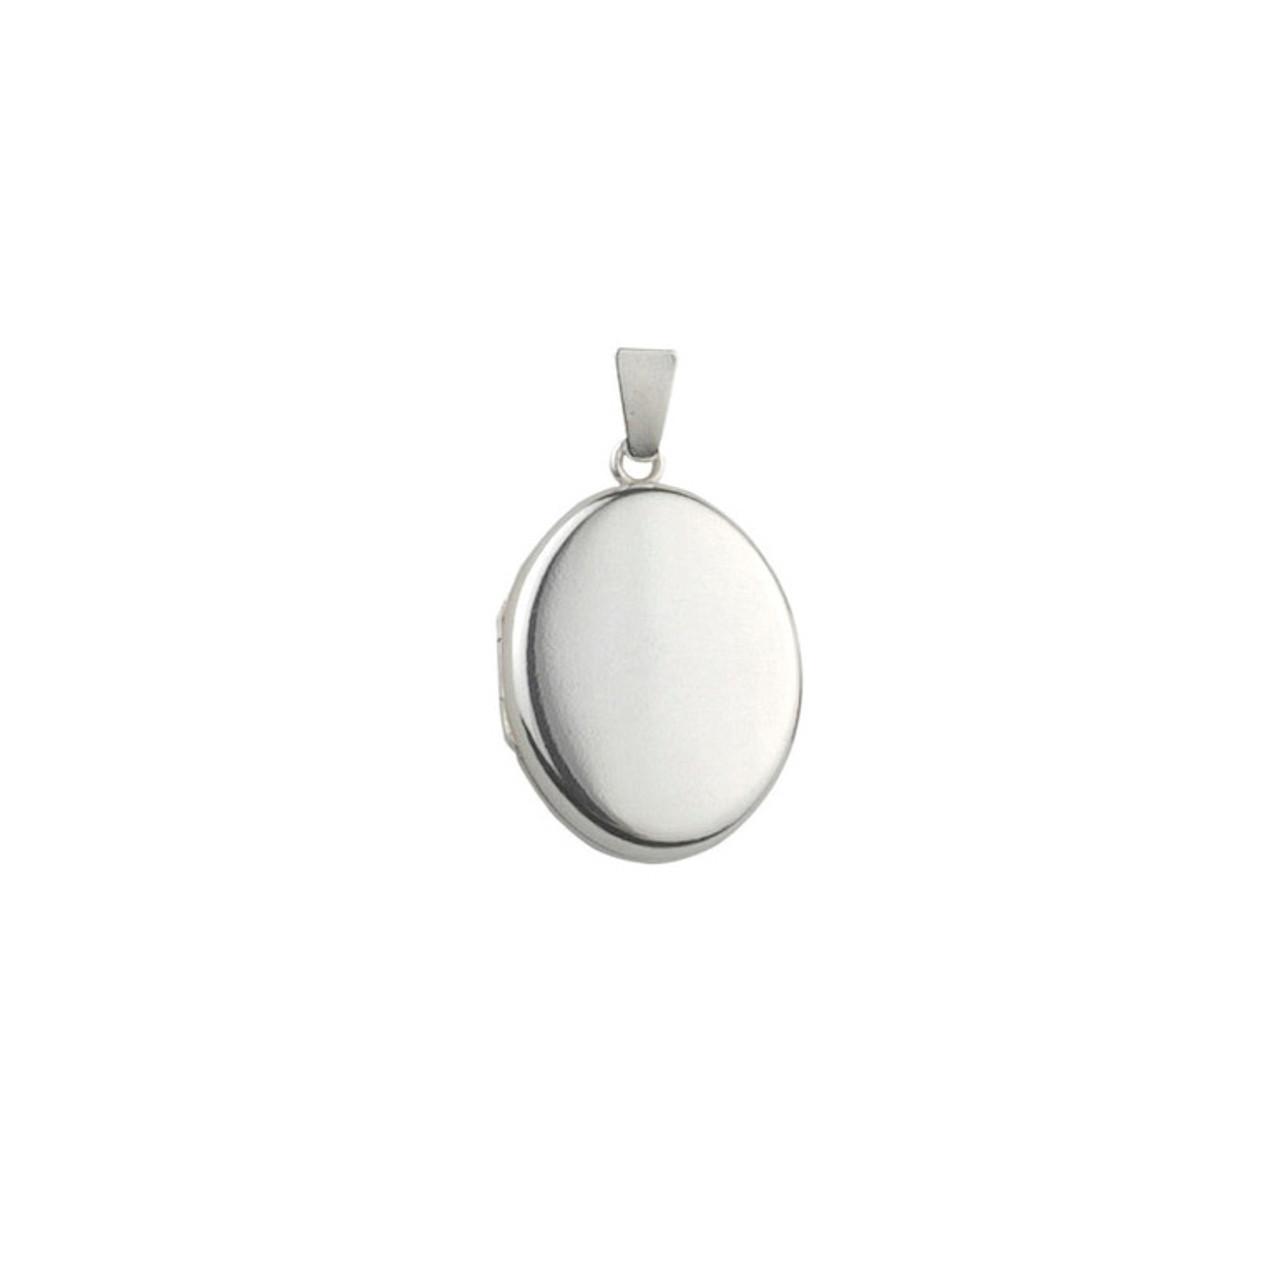 Silver 20mm Oval Locket & Chain